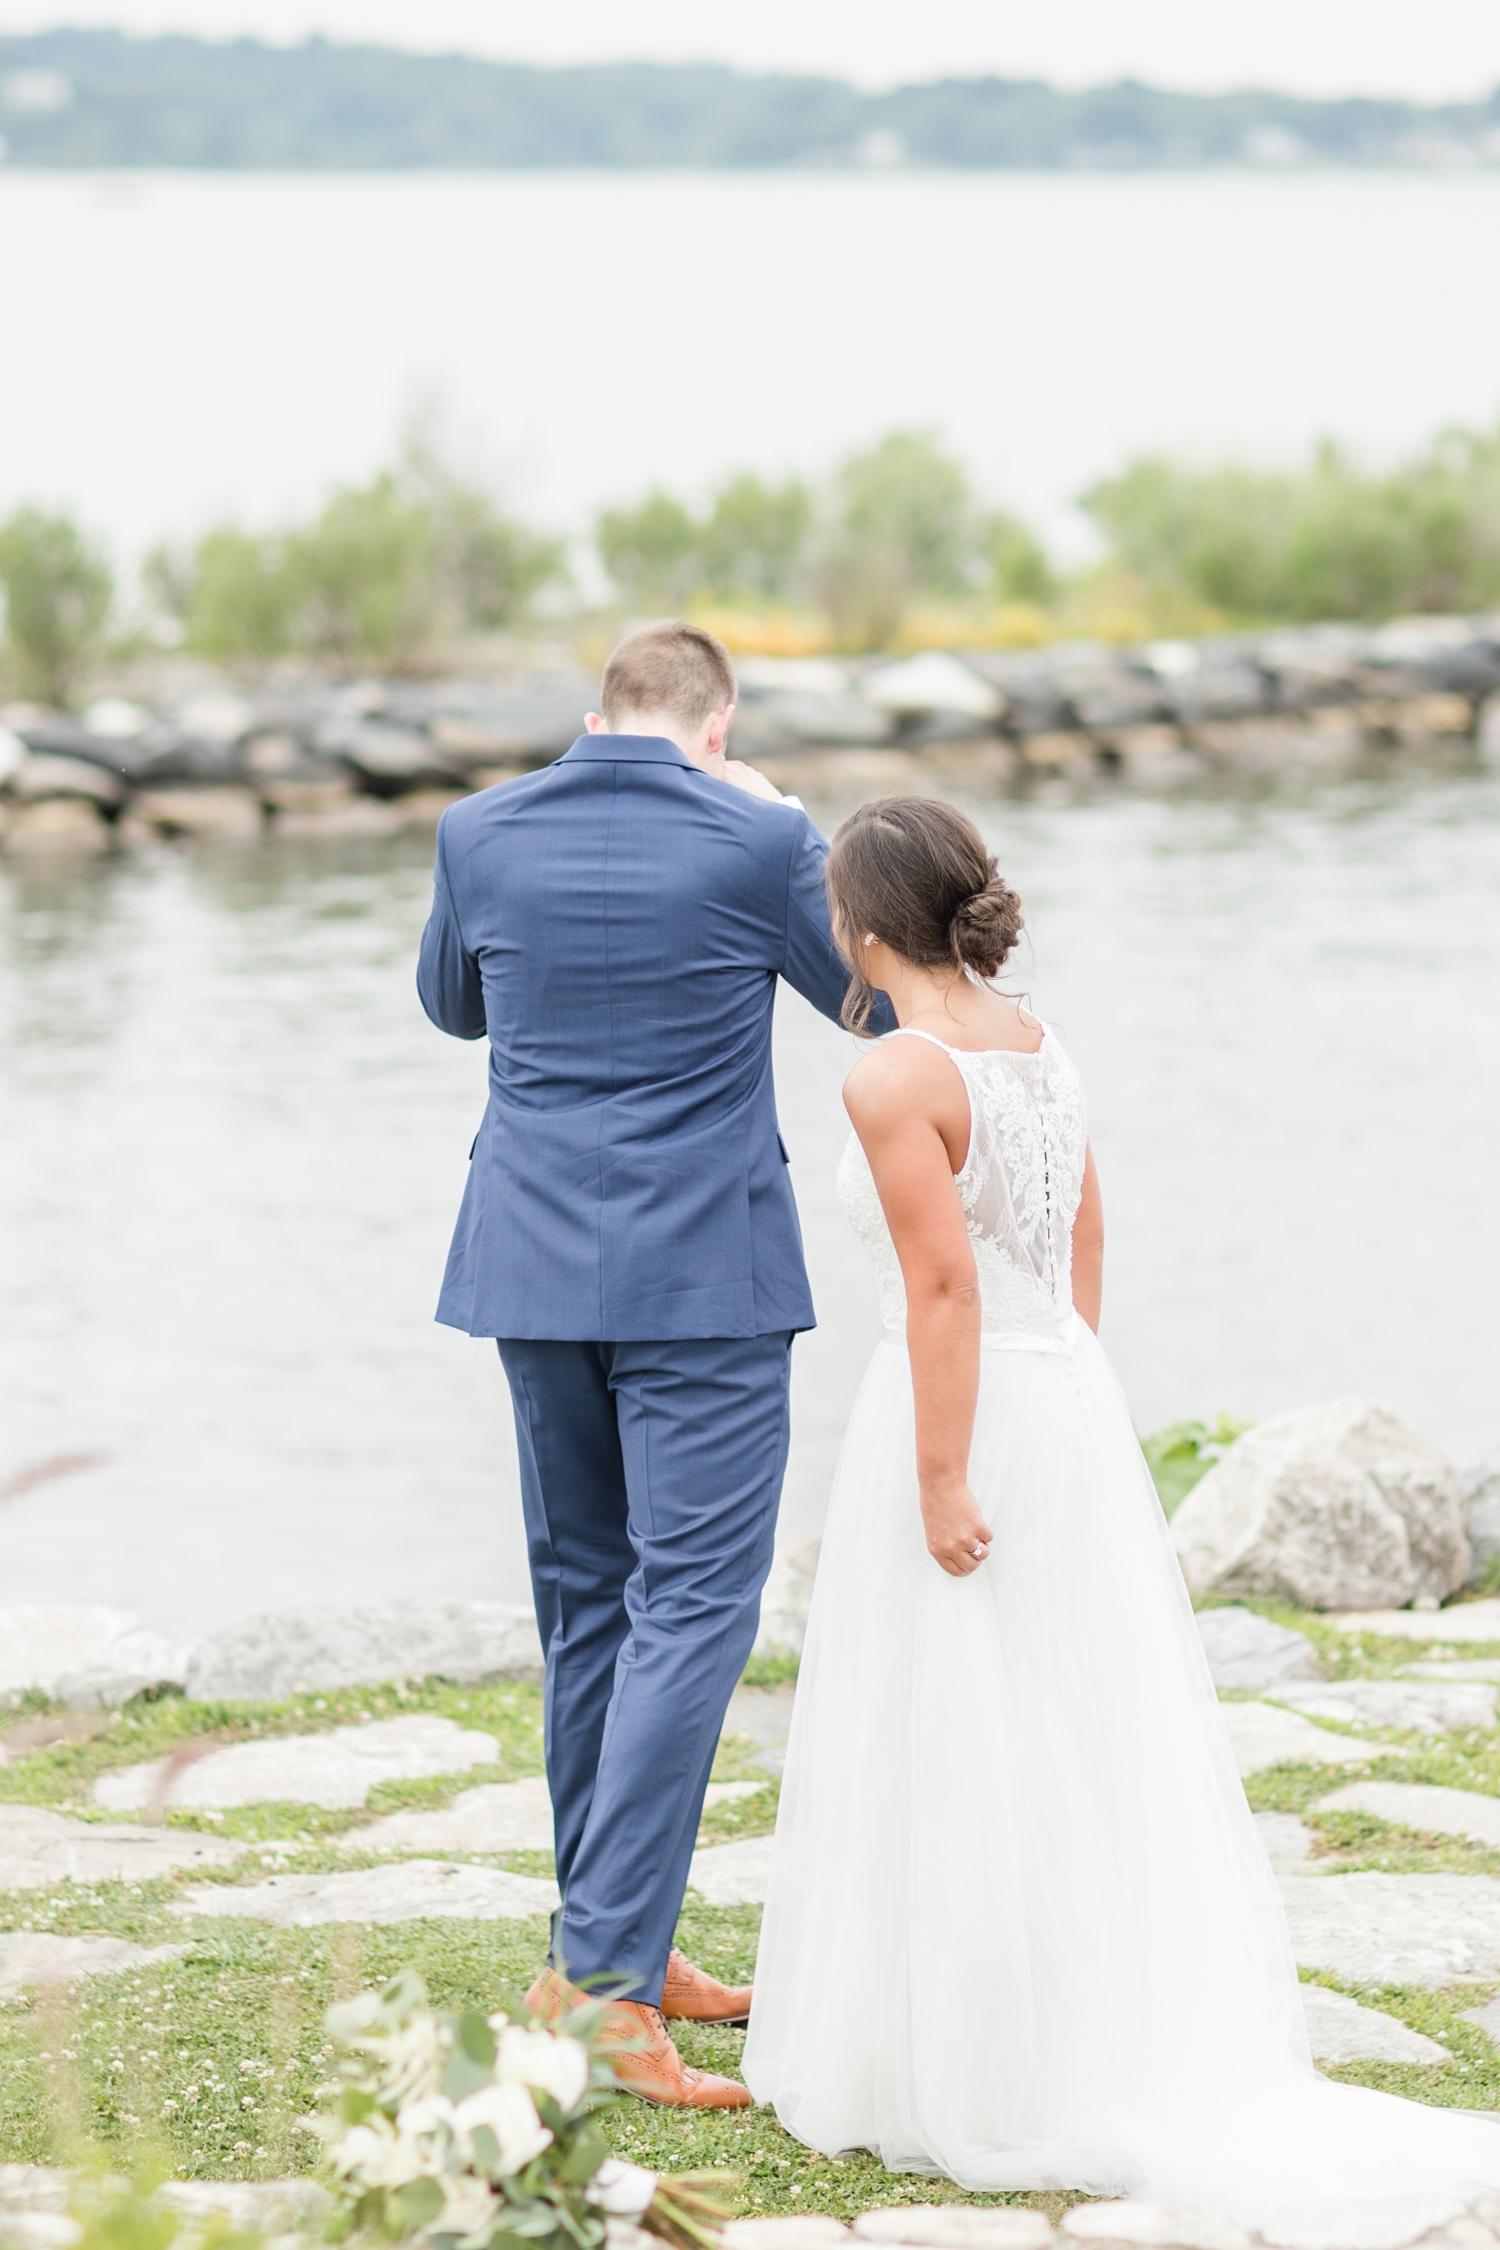 Schindler WEDDING HIGHLIGHTS-120_Herrington-on-the-Bay-wedding-Maryland-wedding-photographer-anna-grace-photography-photo.jpg